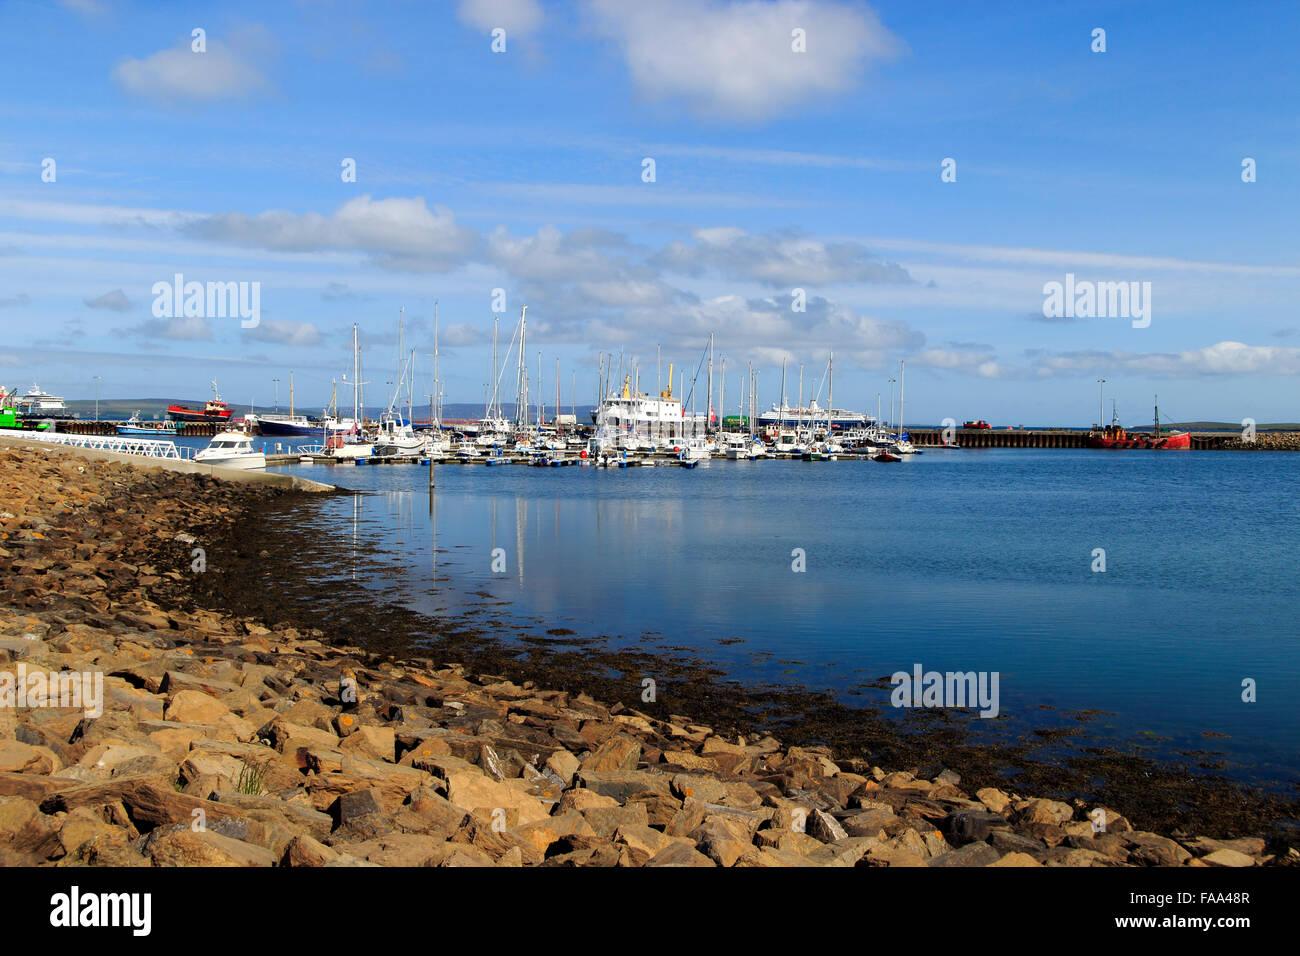 Kirkwall Harbour Orkney Islands Scotland UK - Stock Image